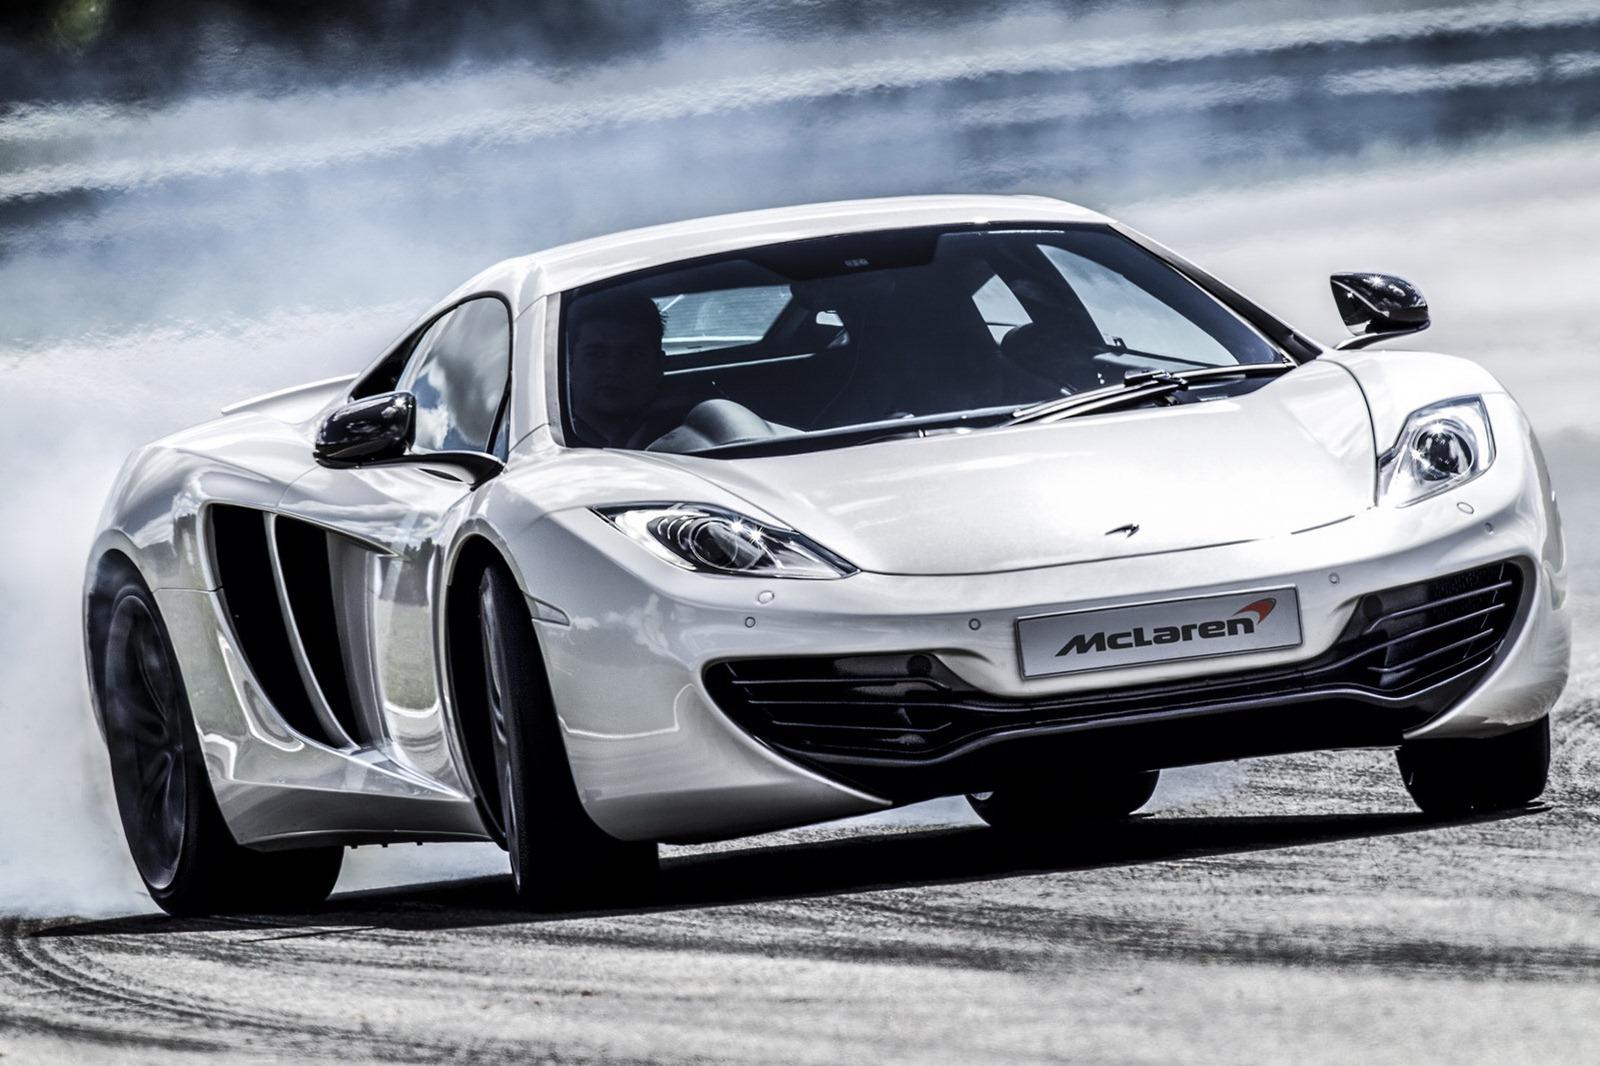 2013-McLaren-MP4-12C-2%5B2%5D.jpg